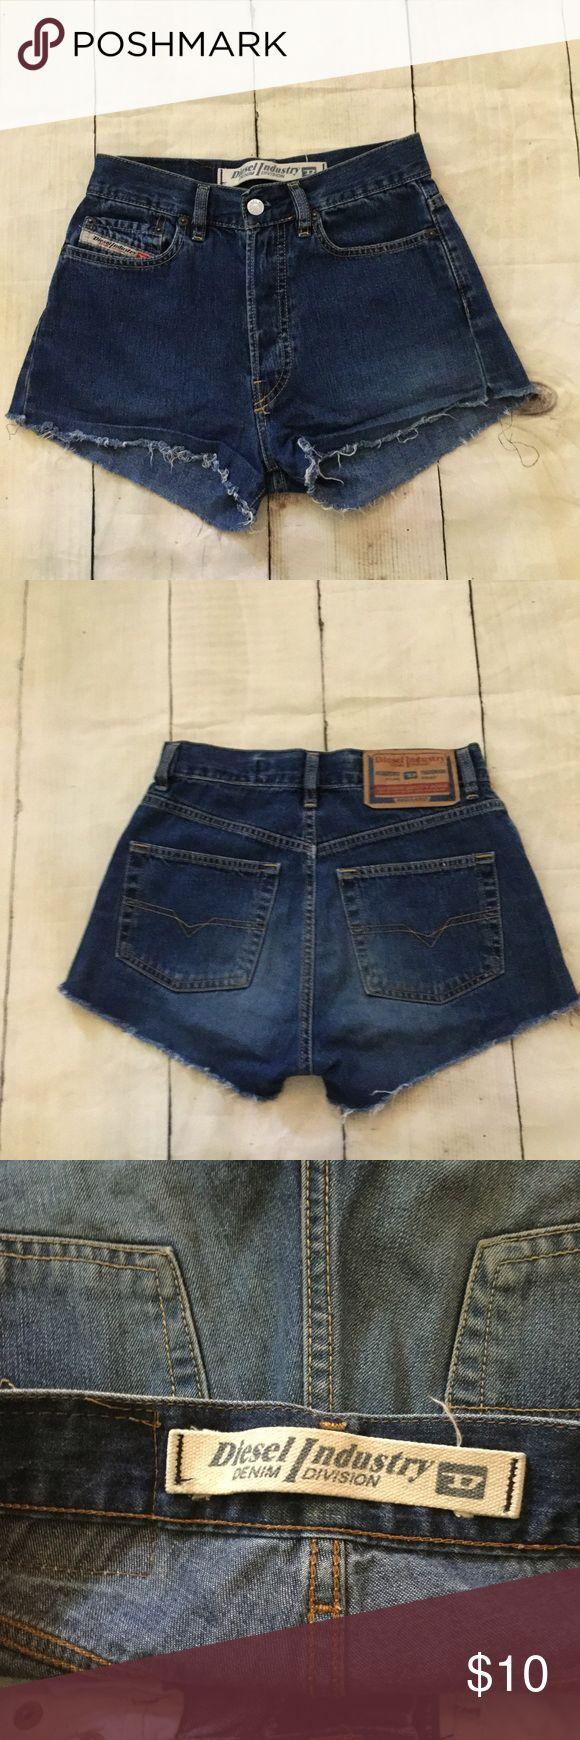 "Diesel Denim Cut Off Shorts Blue Jean High Waist Diesel high Waisted Denim Cut Off Shorts Blue Jean. Size 27. Waist: 28"",  rise: 11"", inseam: 2"" Diesel Shorts Jean Shorts"